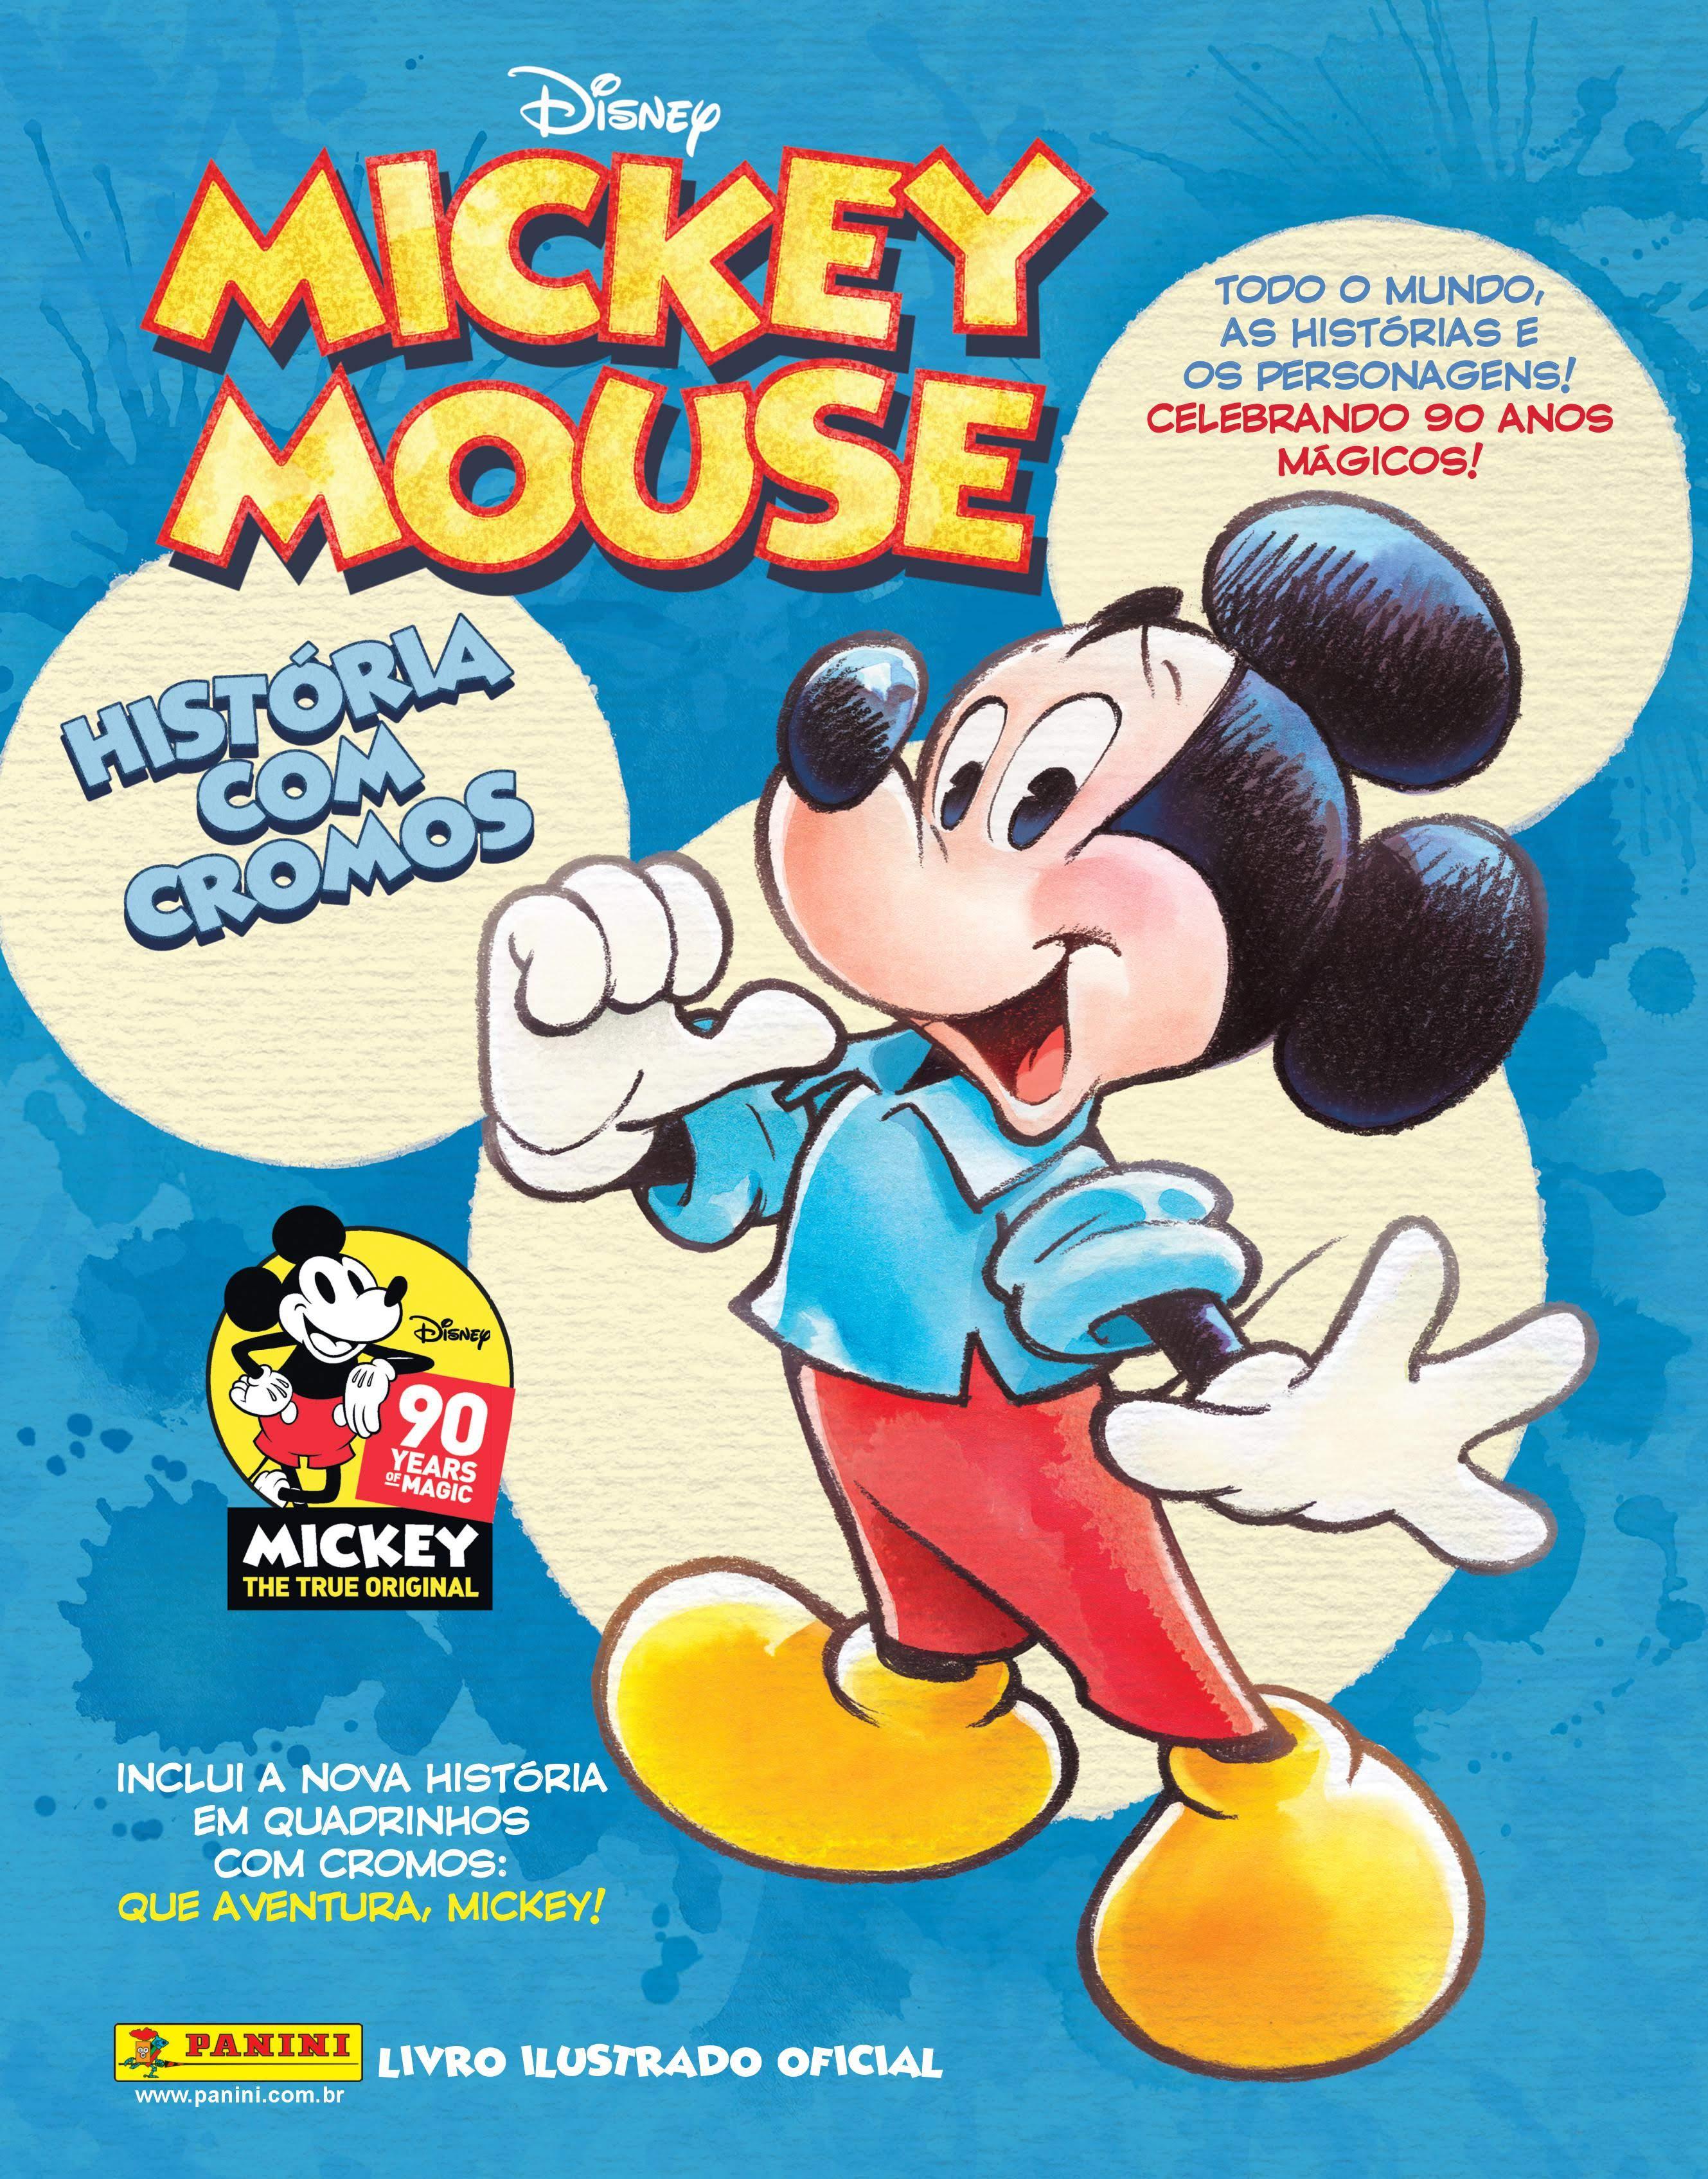 Panini licencia marcas da Disney e lança álbum ilustrado comemorativo…